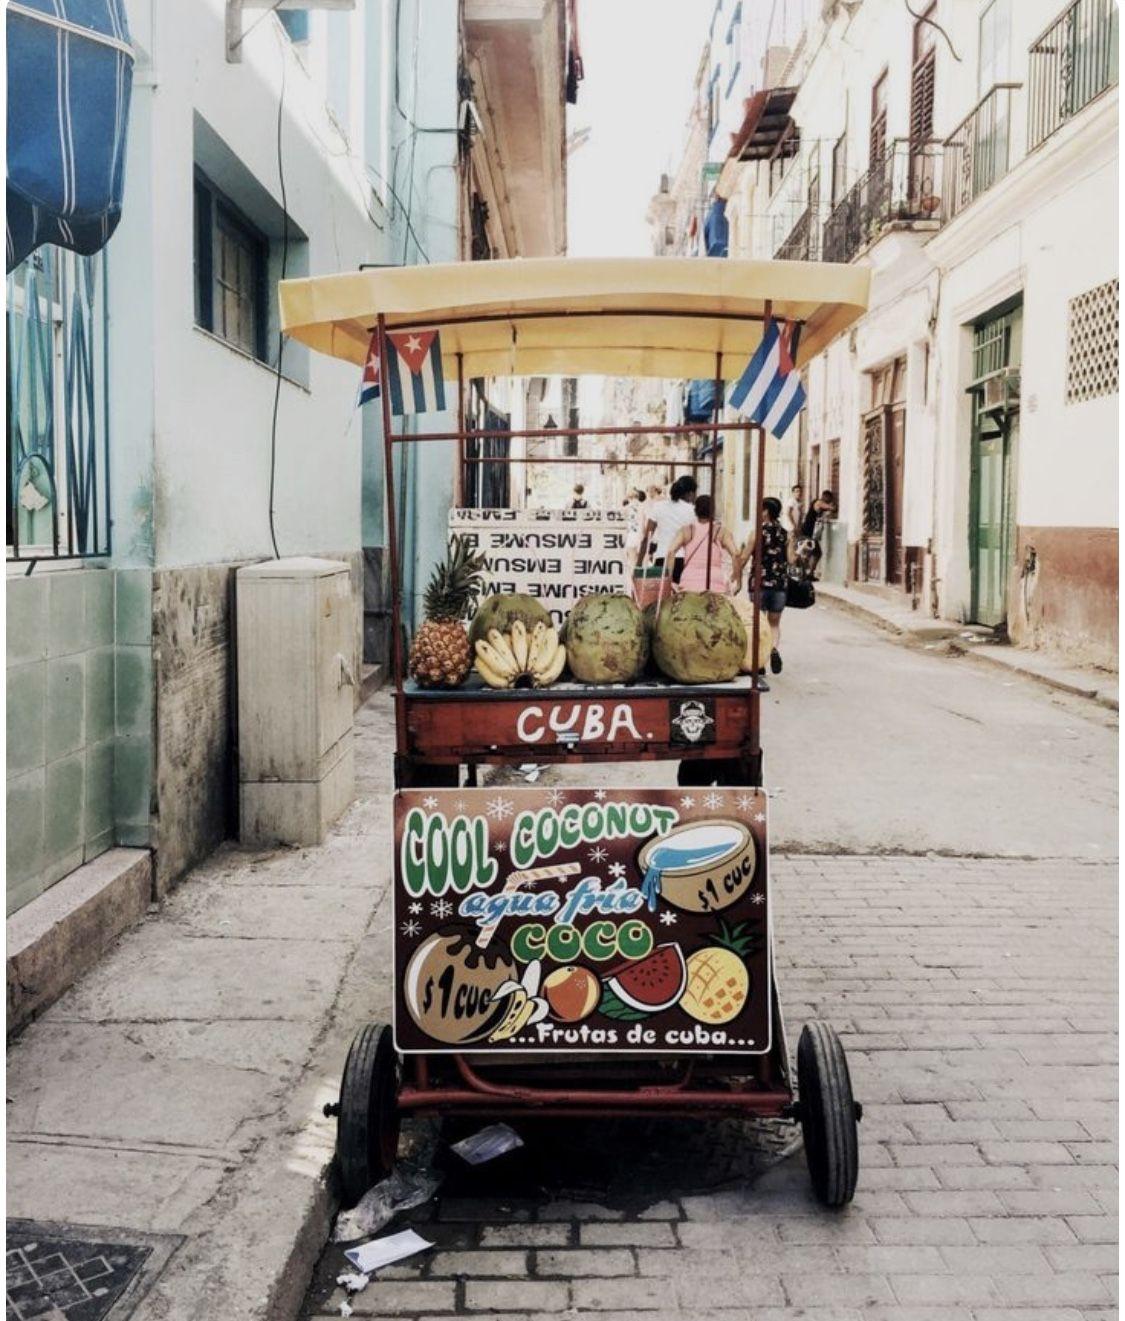 Que ver y hacer en La Habana ¡Guía completa! #lahabana #lahabanavieja #cuba #viajes #viajesporelmundo #viajesbaratos #travel #traveltips #travelphotography #traveldestinations #destinos #destinosparaviajar